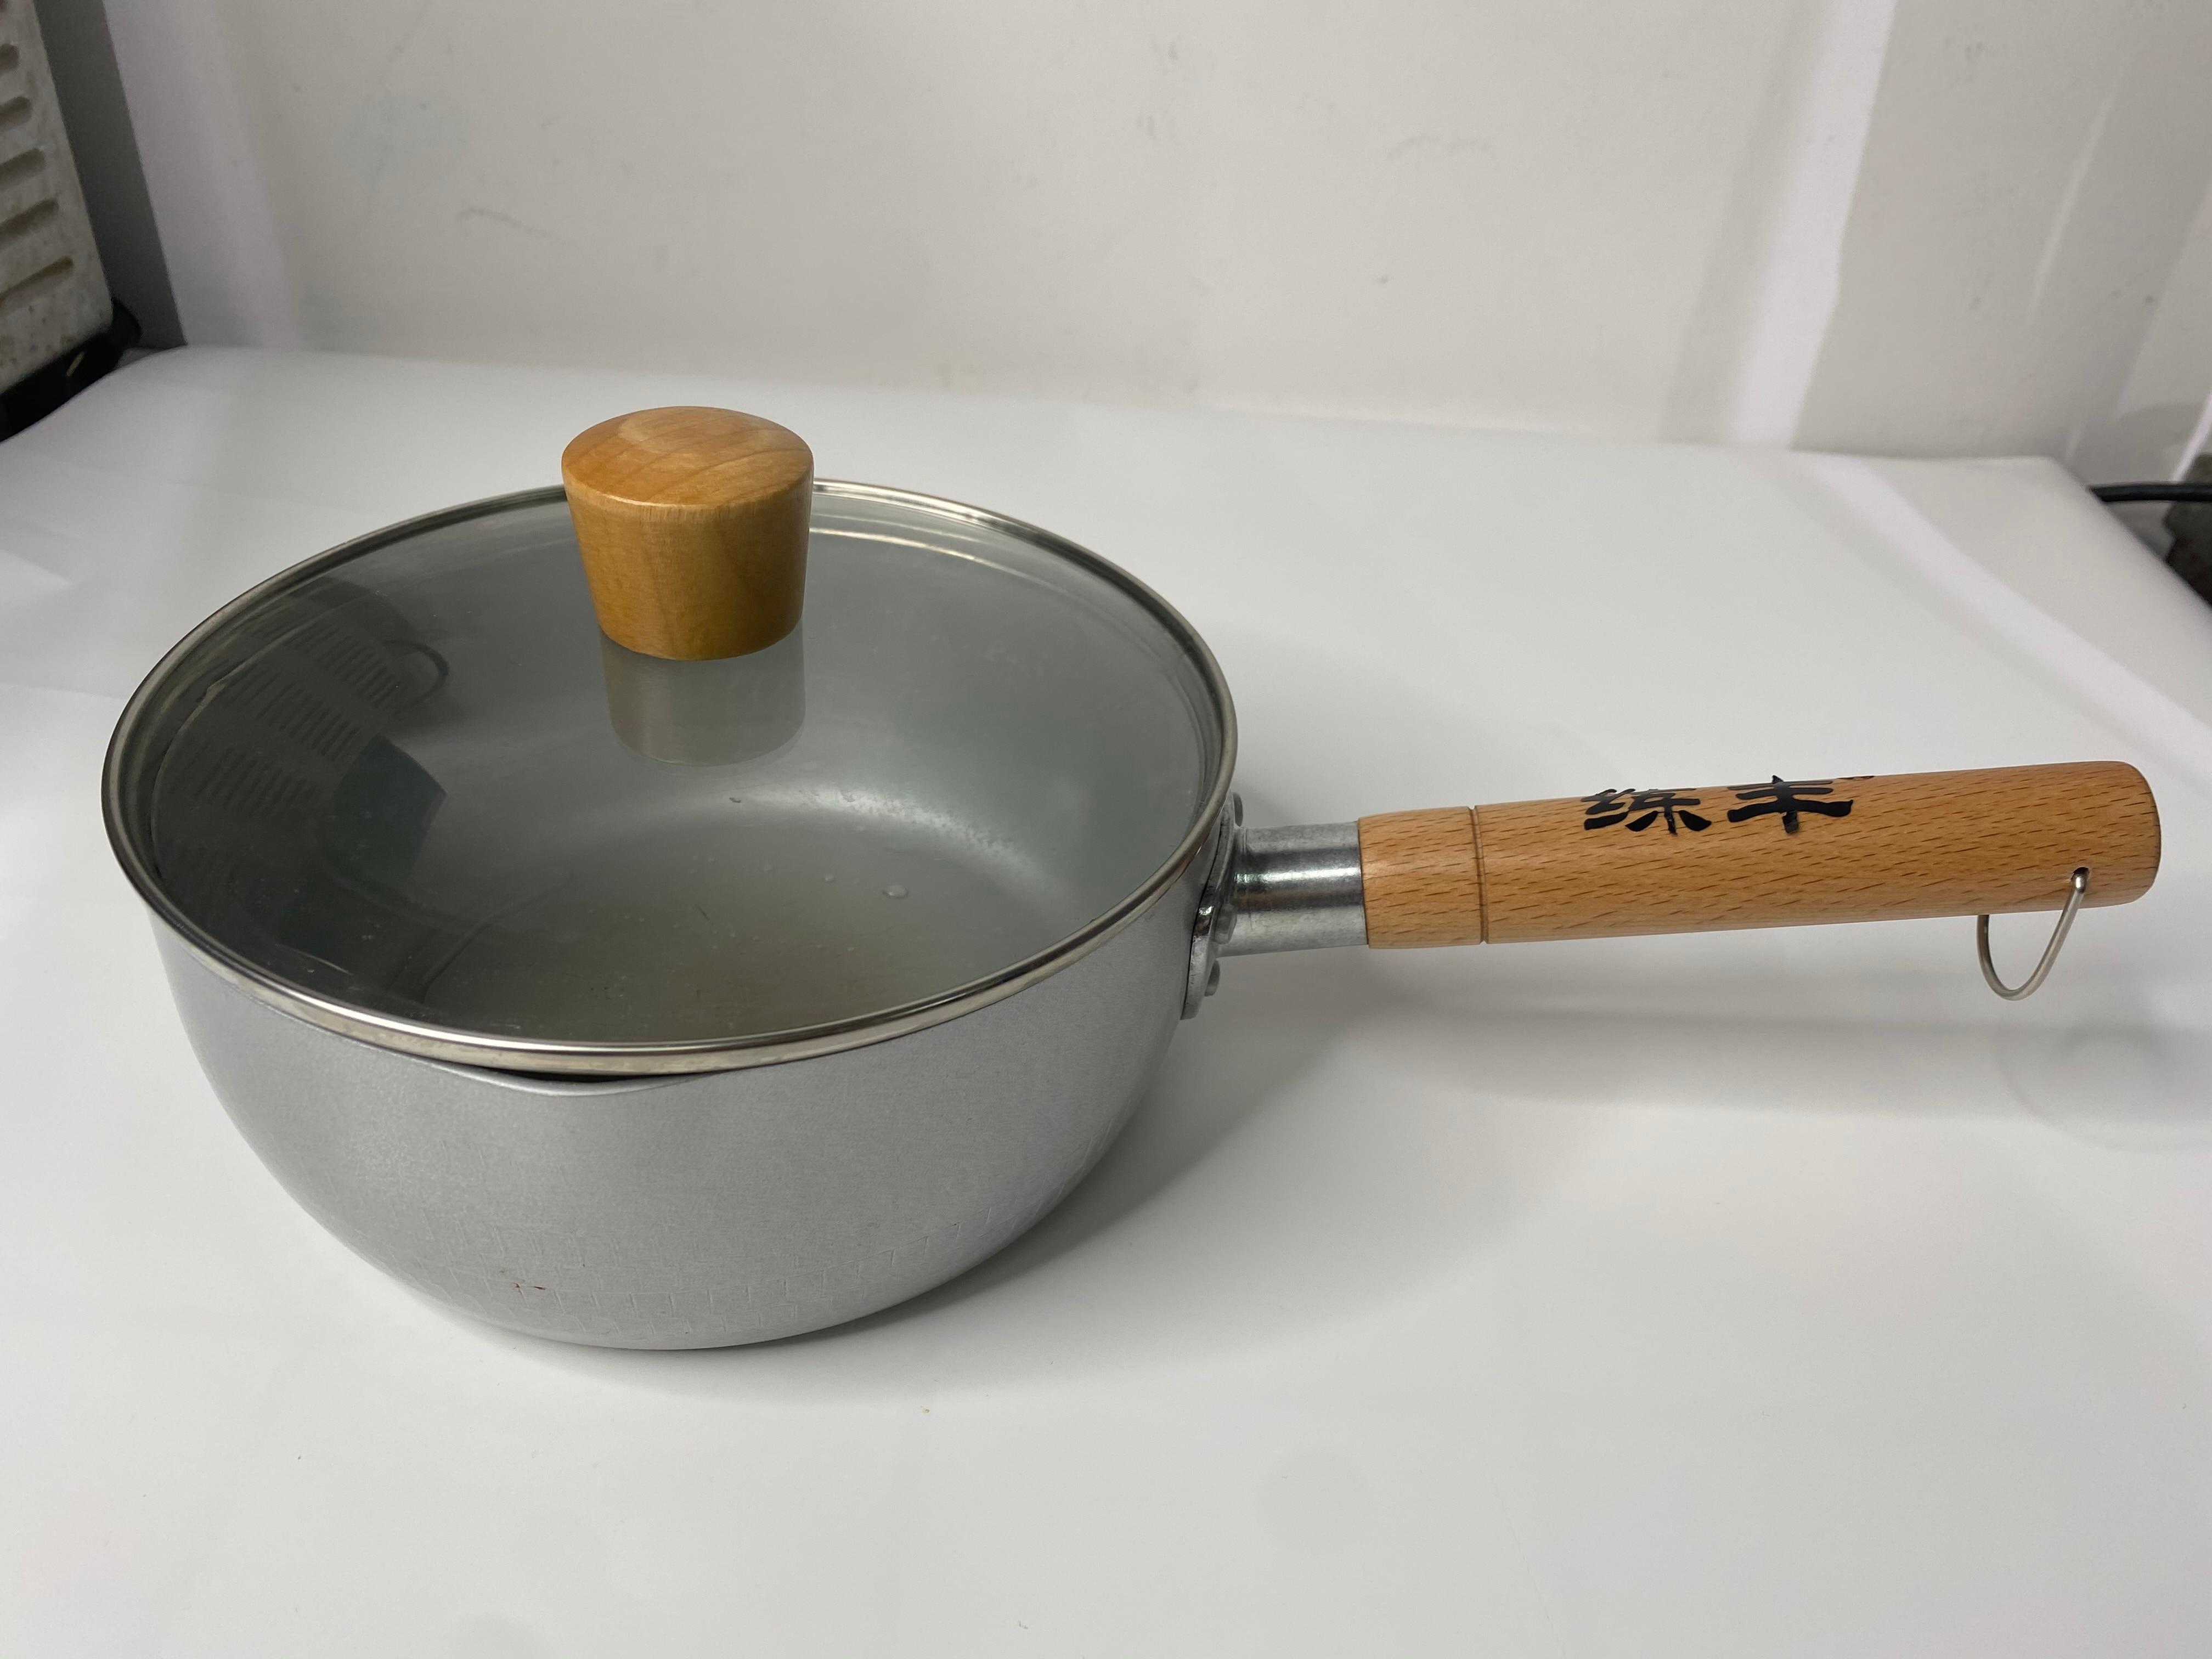 Saucepan Small Cookware Soup-Pot Cooking-Tool Noodles Non-Stick-Pan Porridge Milk Kitchen